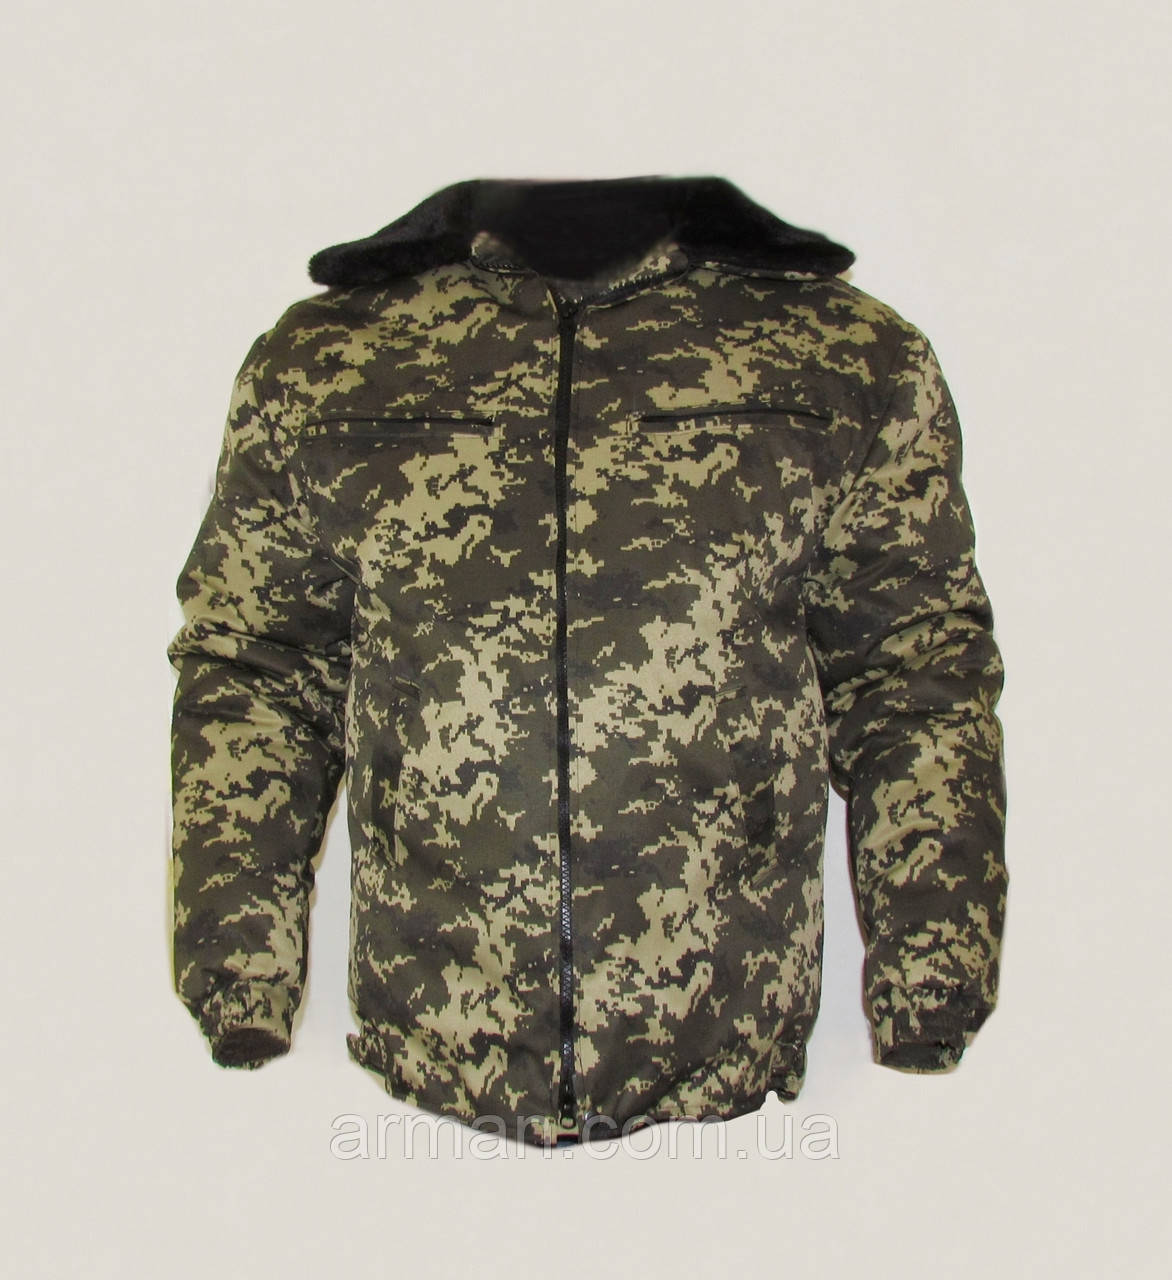 Купить Куртка Бушлат